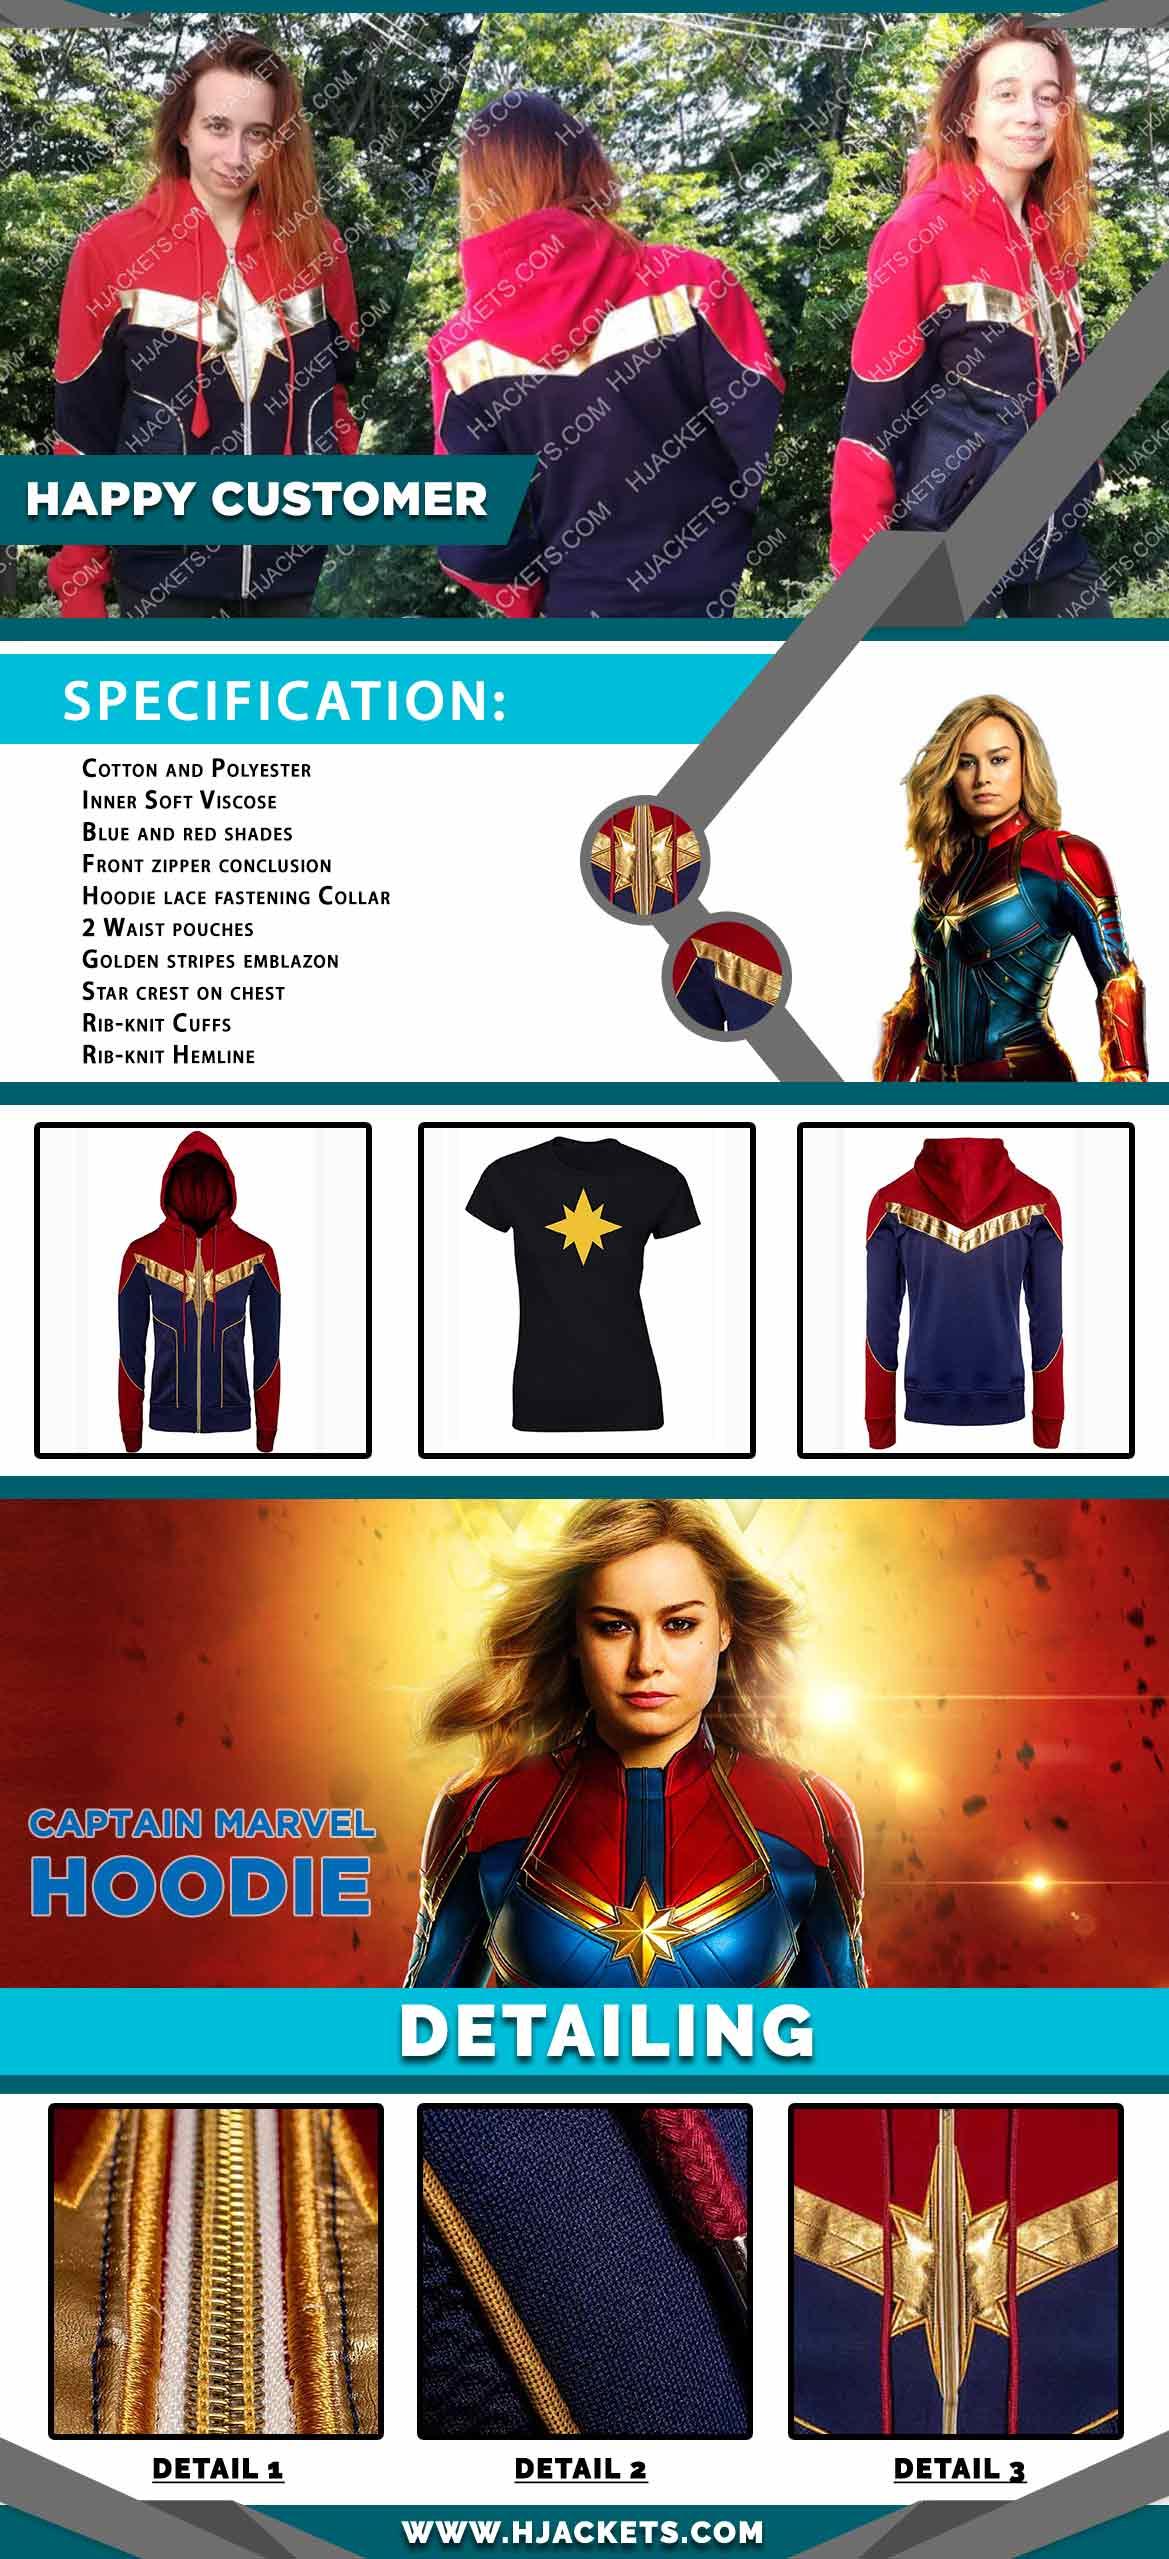 captain marvel hoodie info